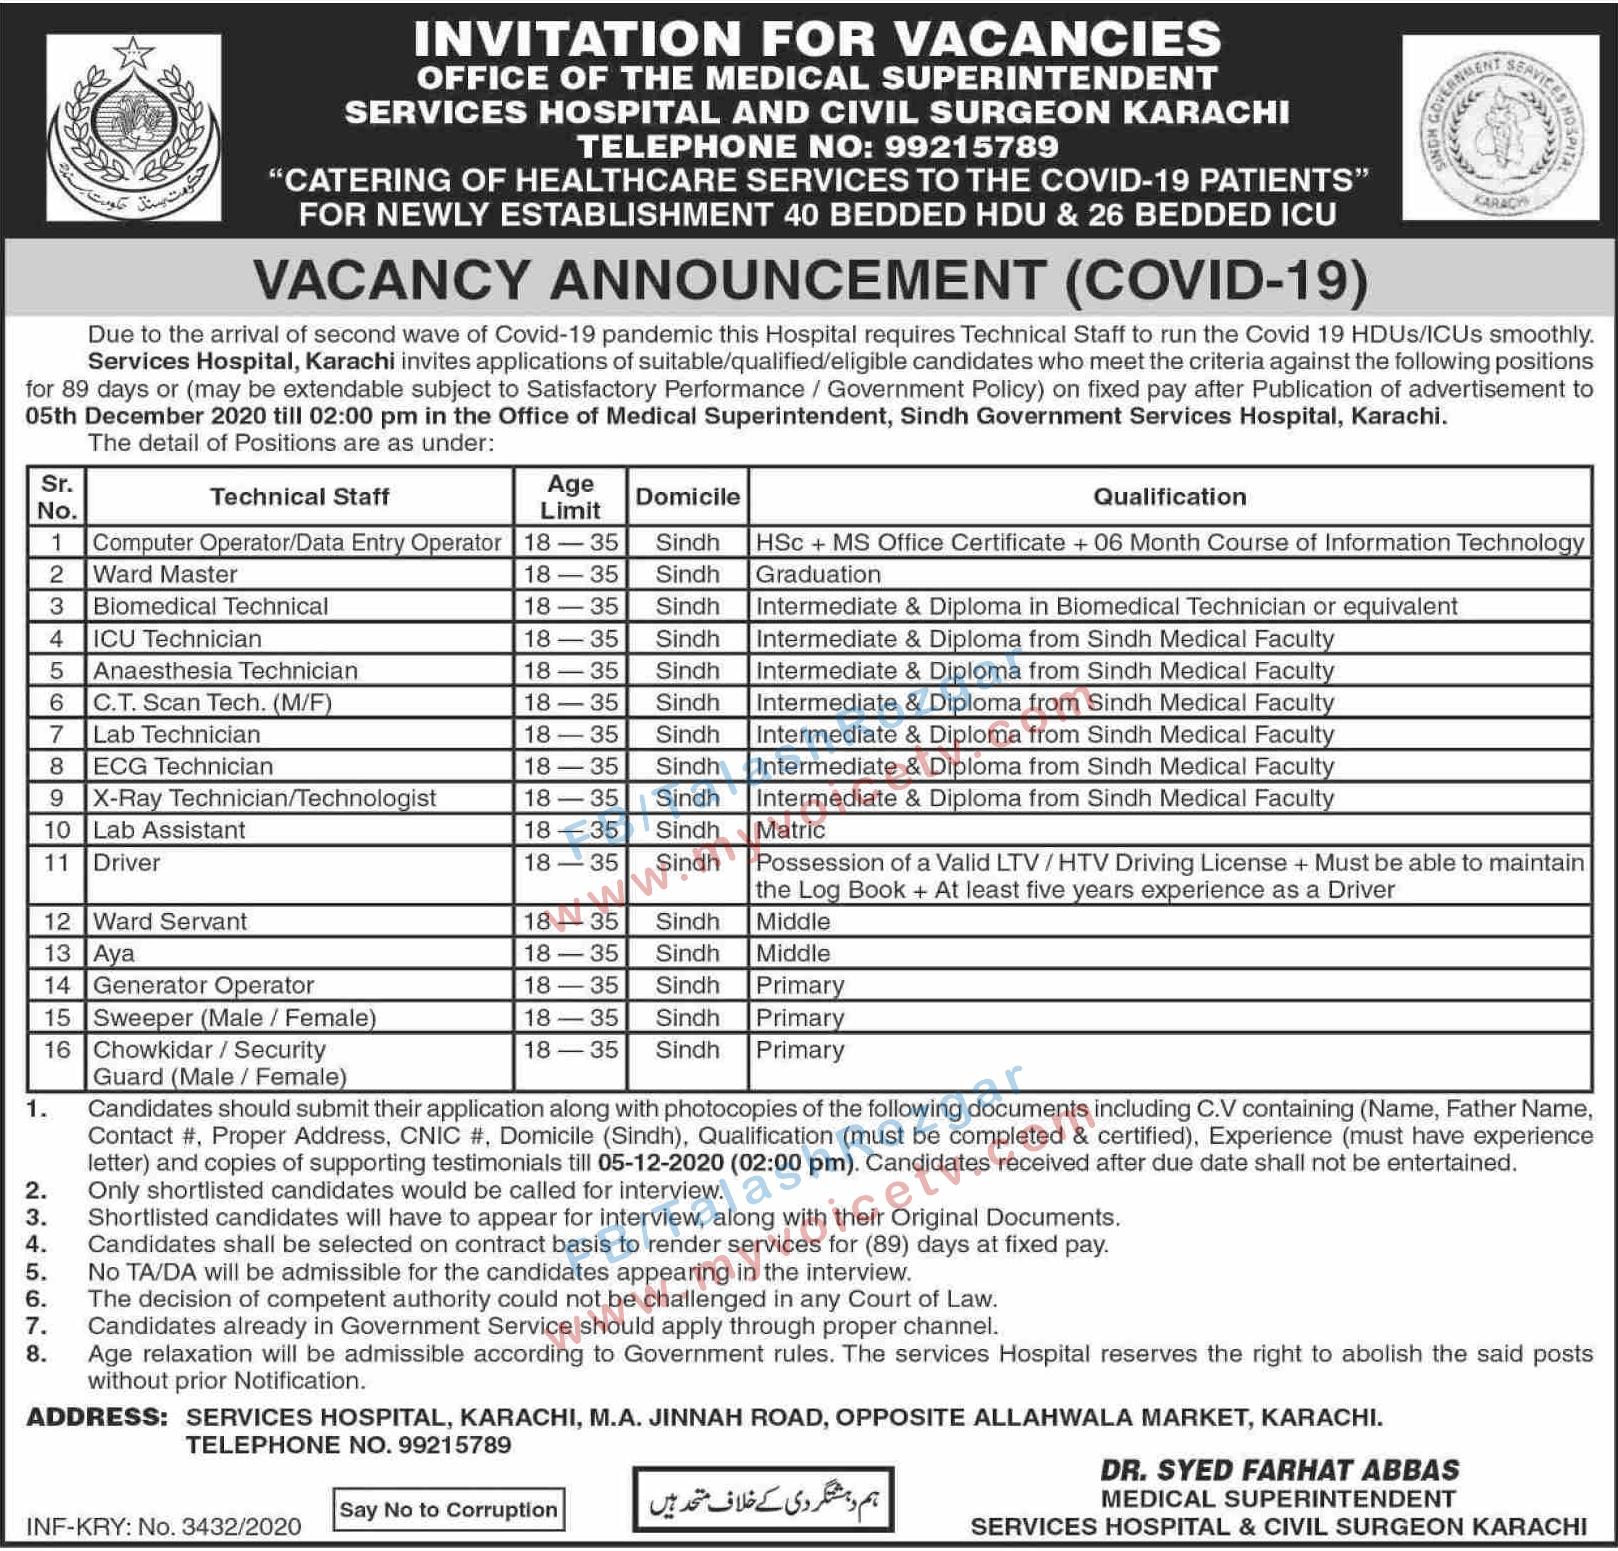 👉 #Jobs - #Career_Opportunities - So many  #Jobs at Govt Hospitals  Laste date 05 December 2020